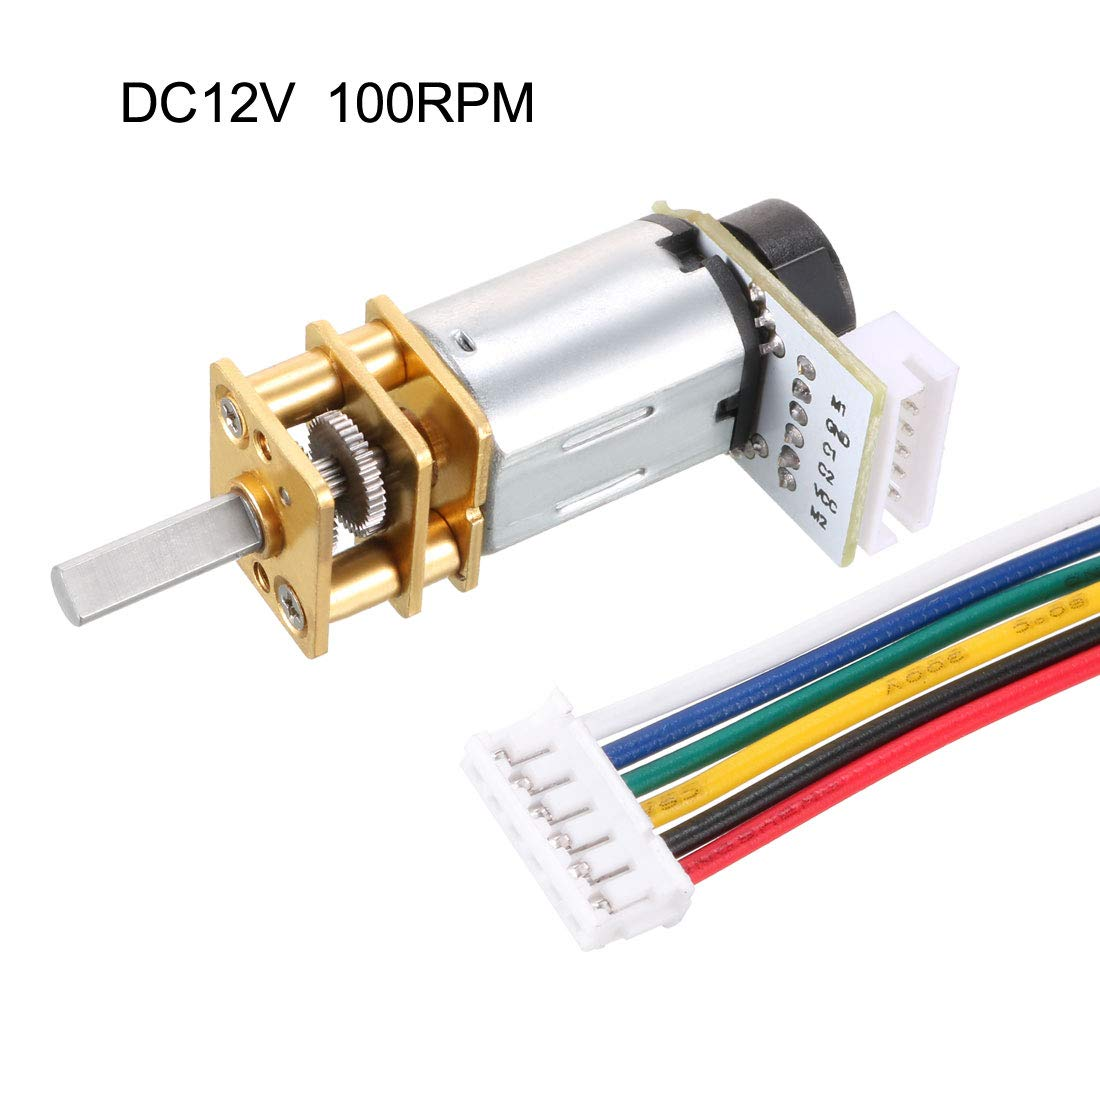 uxcell GA12-N20 12V 190RPM DC Gear Motor with Encoder Speed Velocity Measurement for Mini Car Balance Motor Encoder DIY